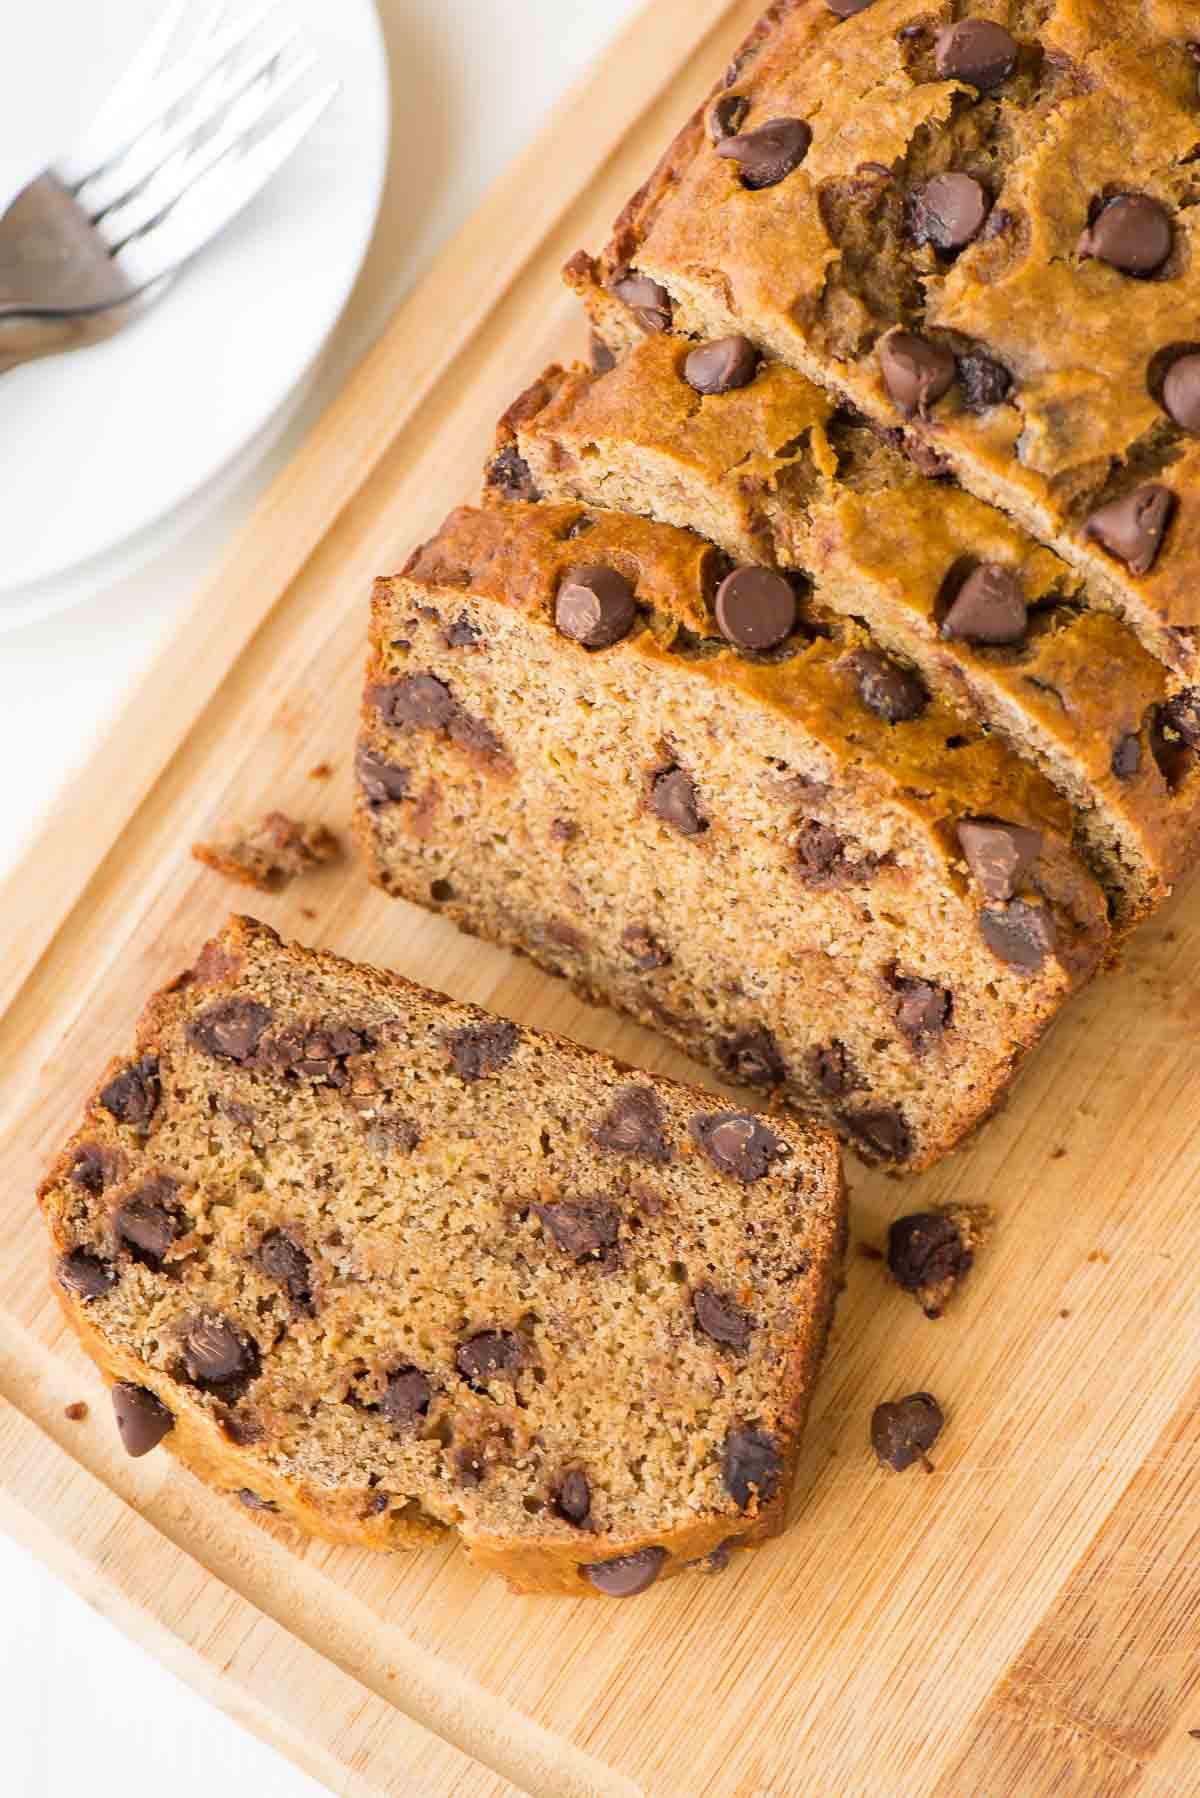 Healthy Banan Bread  Healthy Banana Bread Recipe with Chocolate Chips